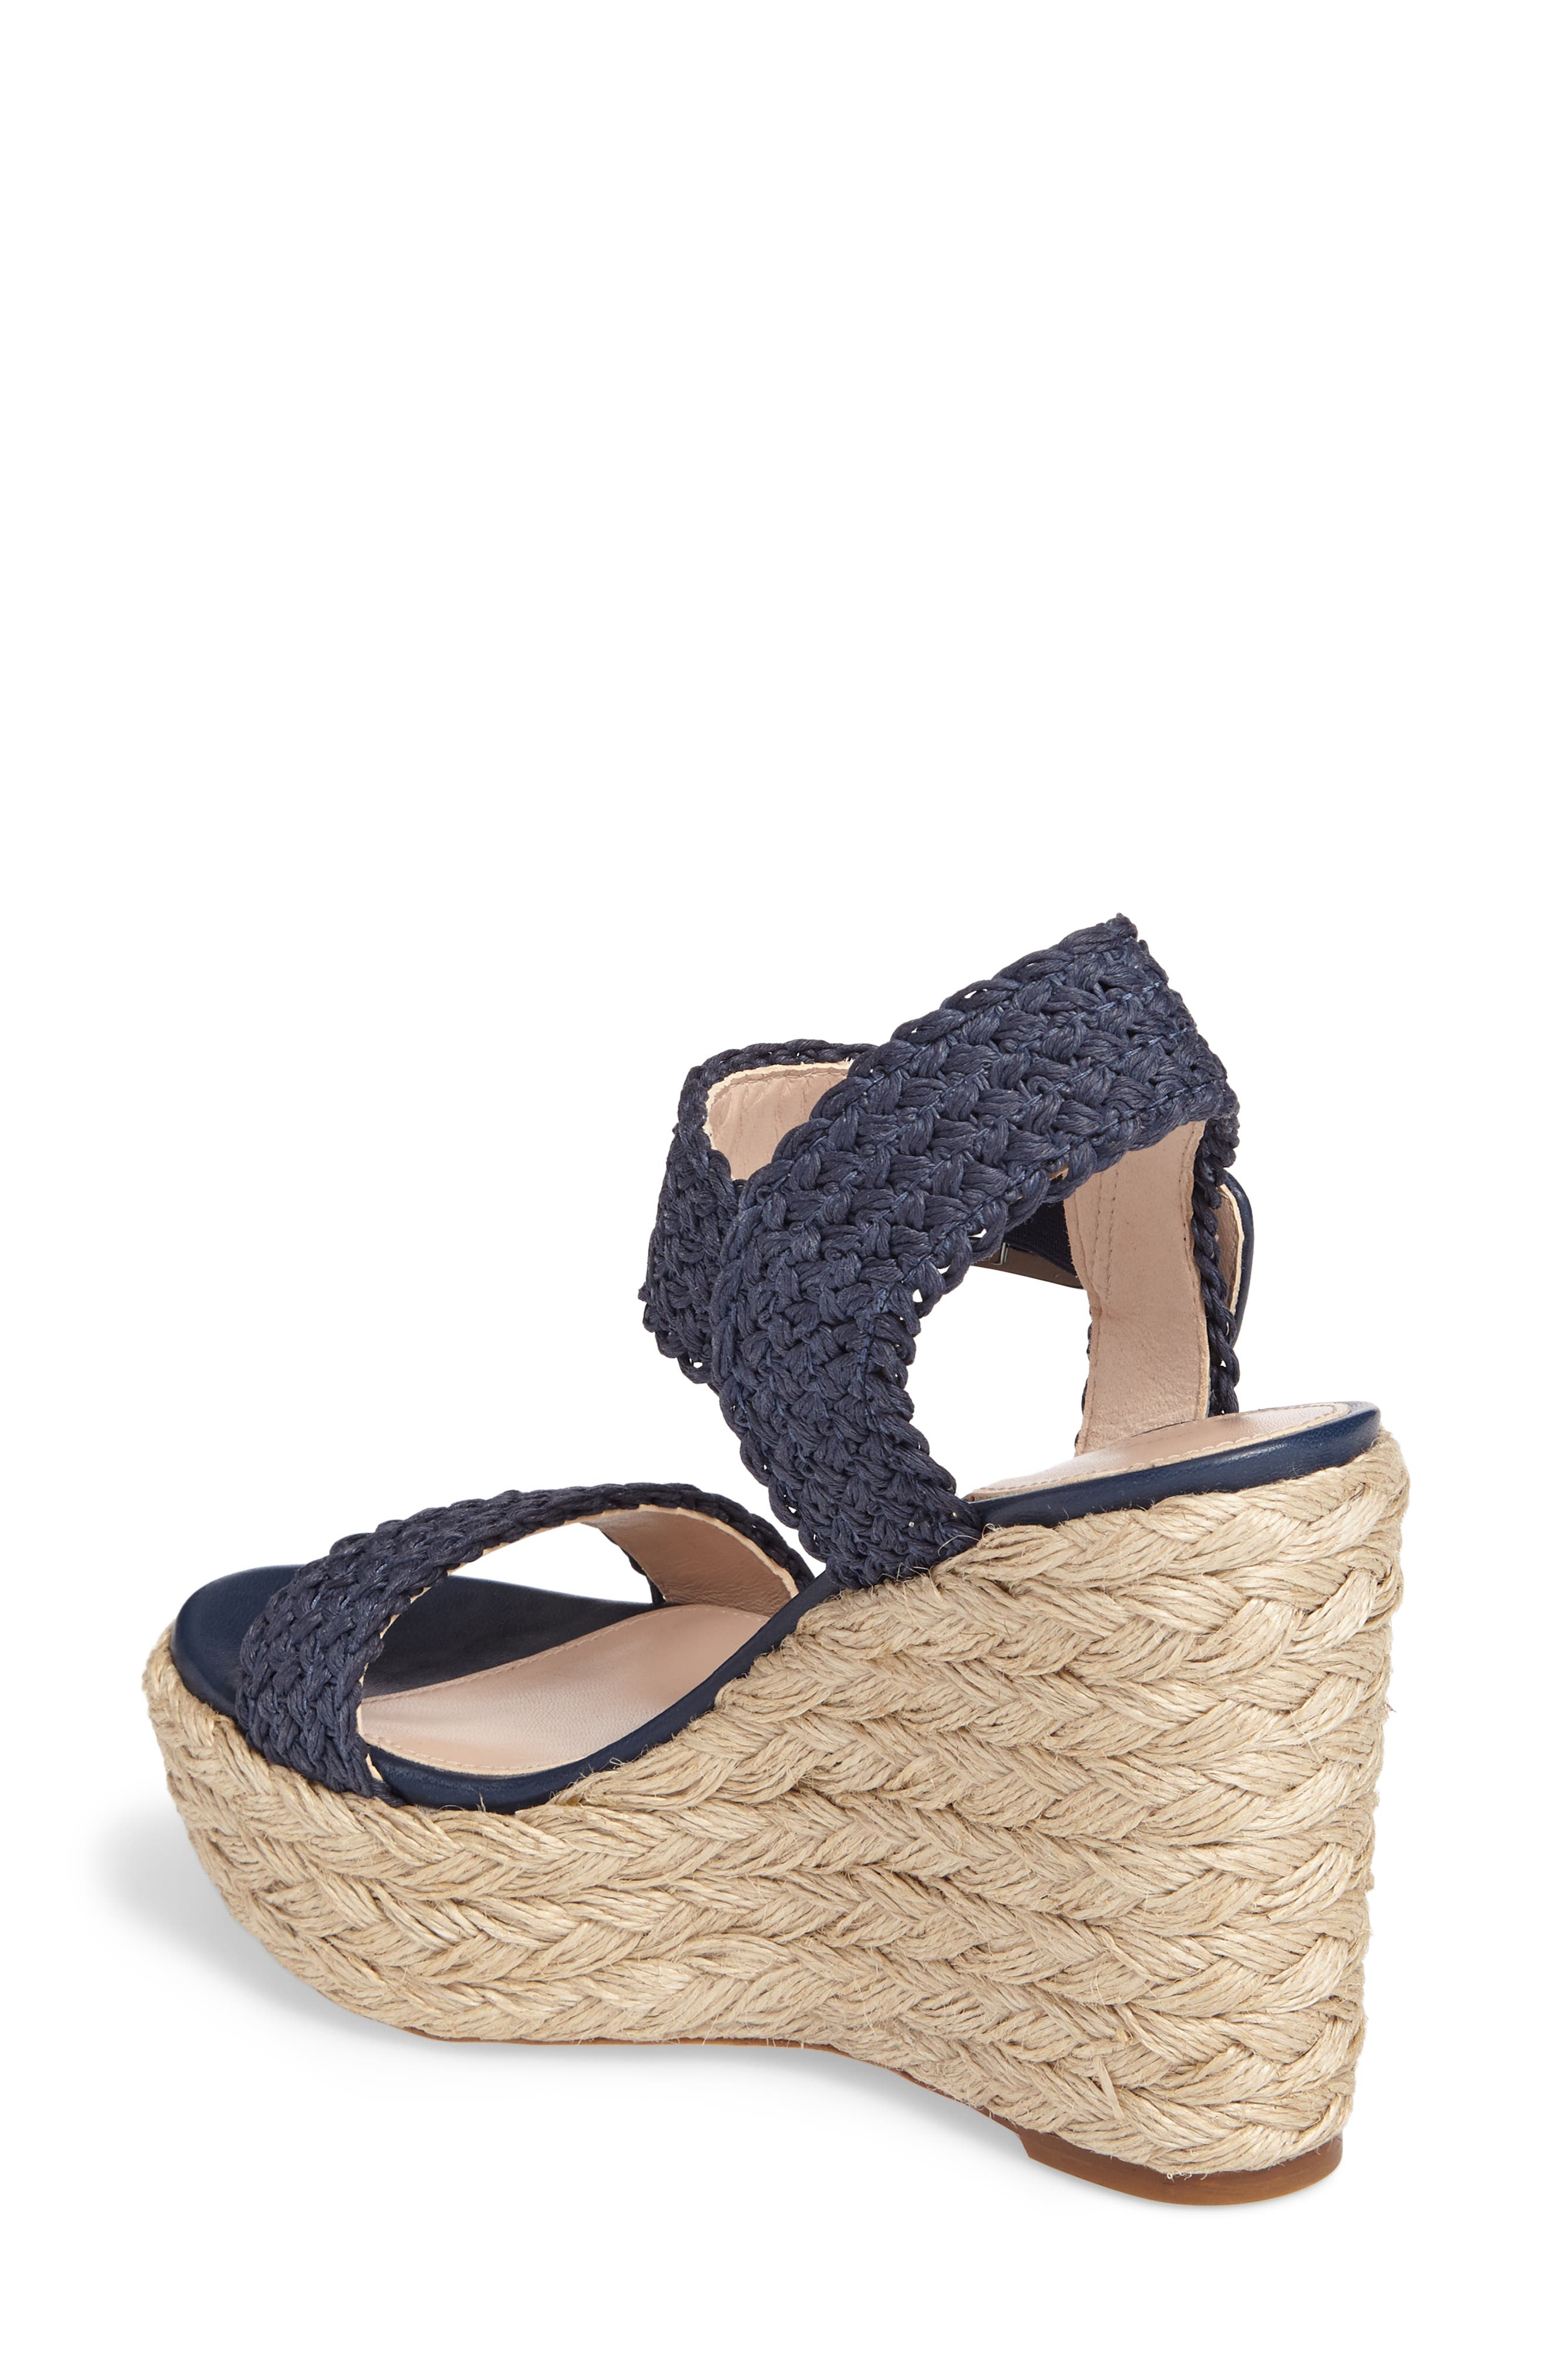 Alexis Espadrille Platform Wedge,                             Alternate thumbnail 2, color,                             Nice Blue Crochet